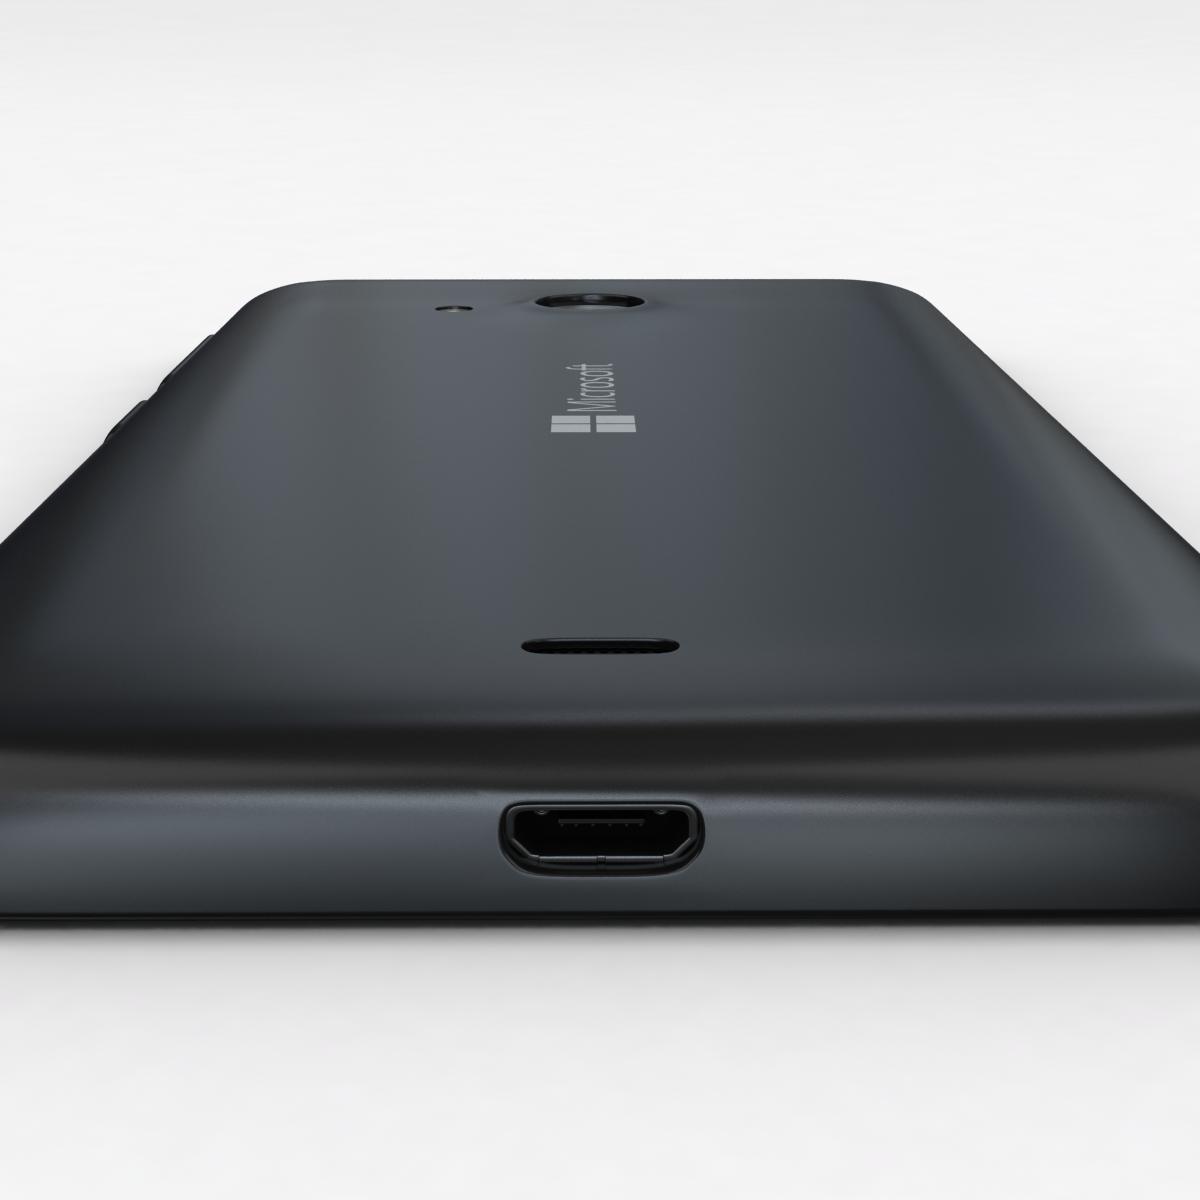 microsoft lumia 535 and dual sim black 3d model 3ds max fbx c4d obj 204358